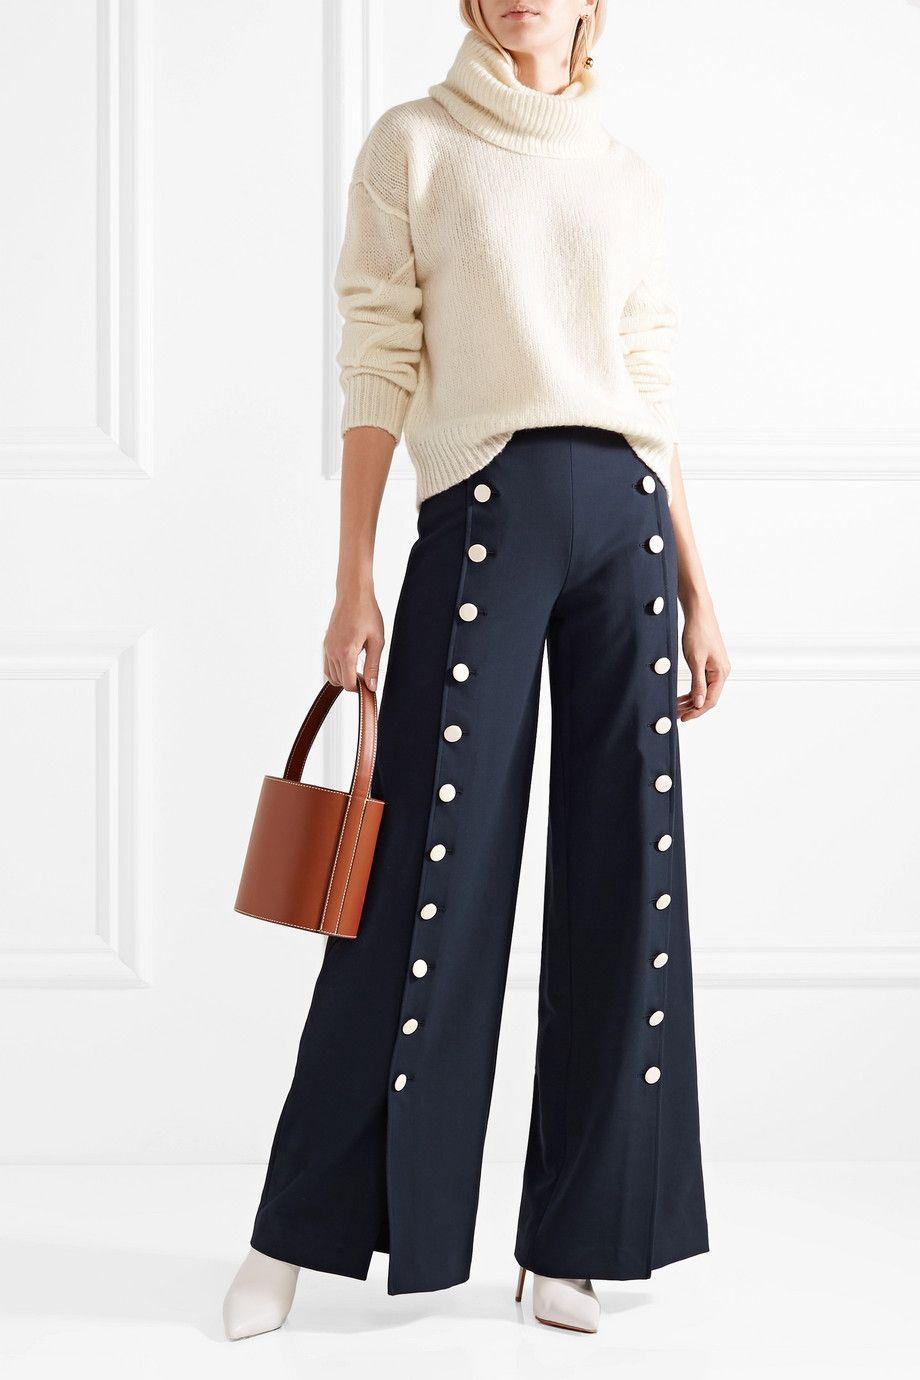 #PopbelaOOTD: 11 Celana Keren buat Kamu yang Bosan dengan Jeans